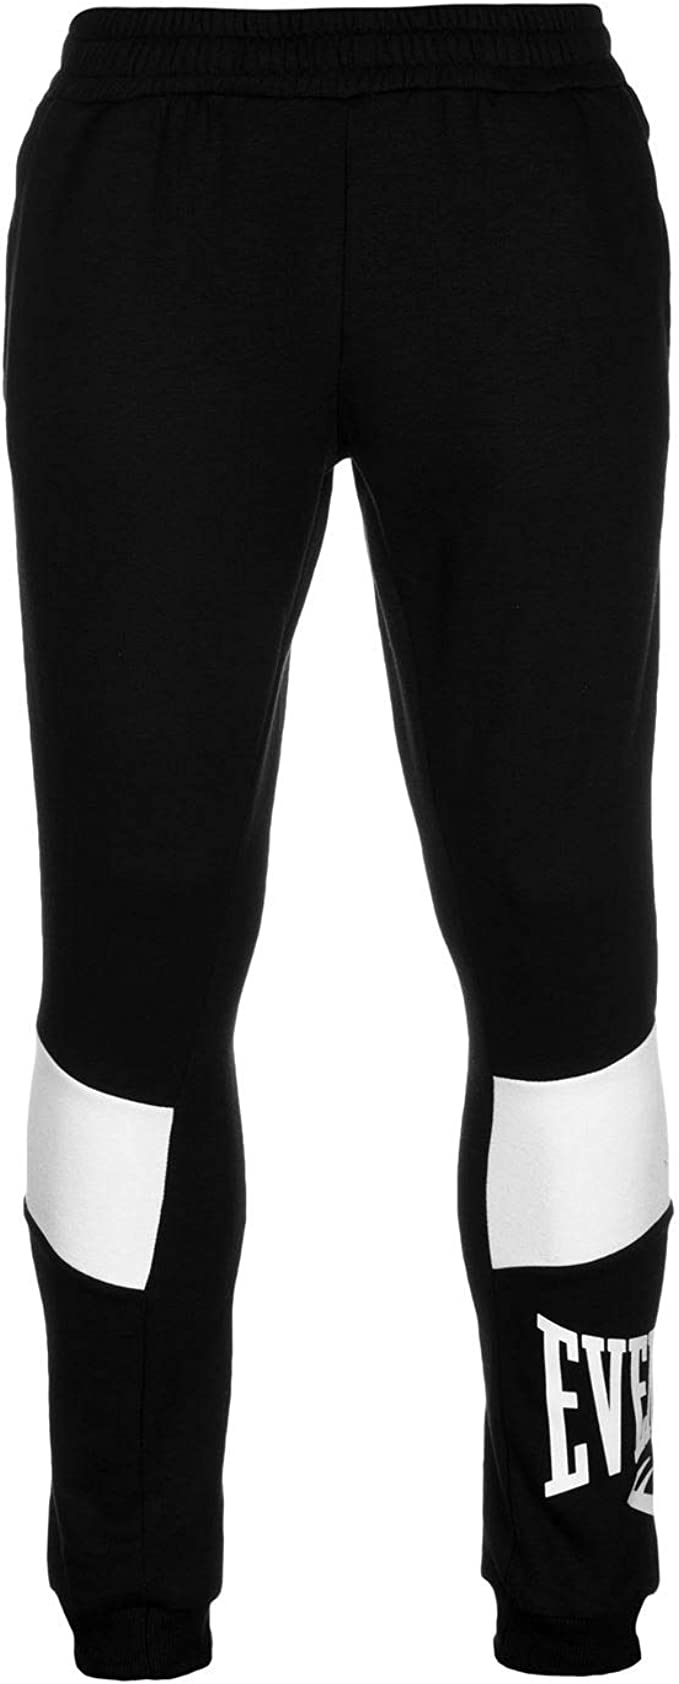 Everlast Mens Jogging Bottoms Fleece Trousers Pants Warm Drawstring Elasticated